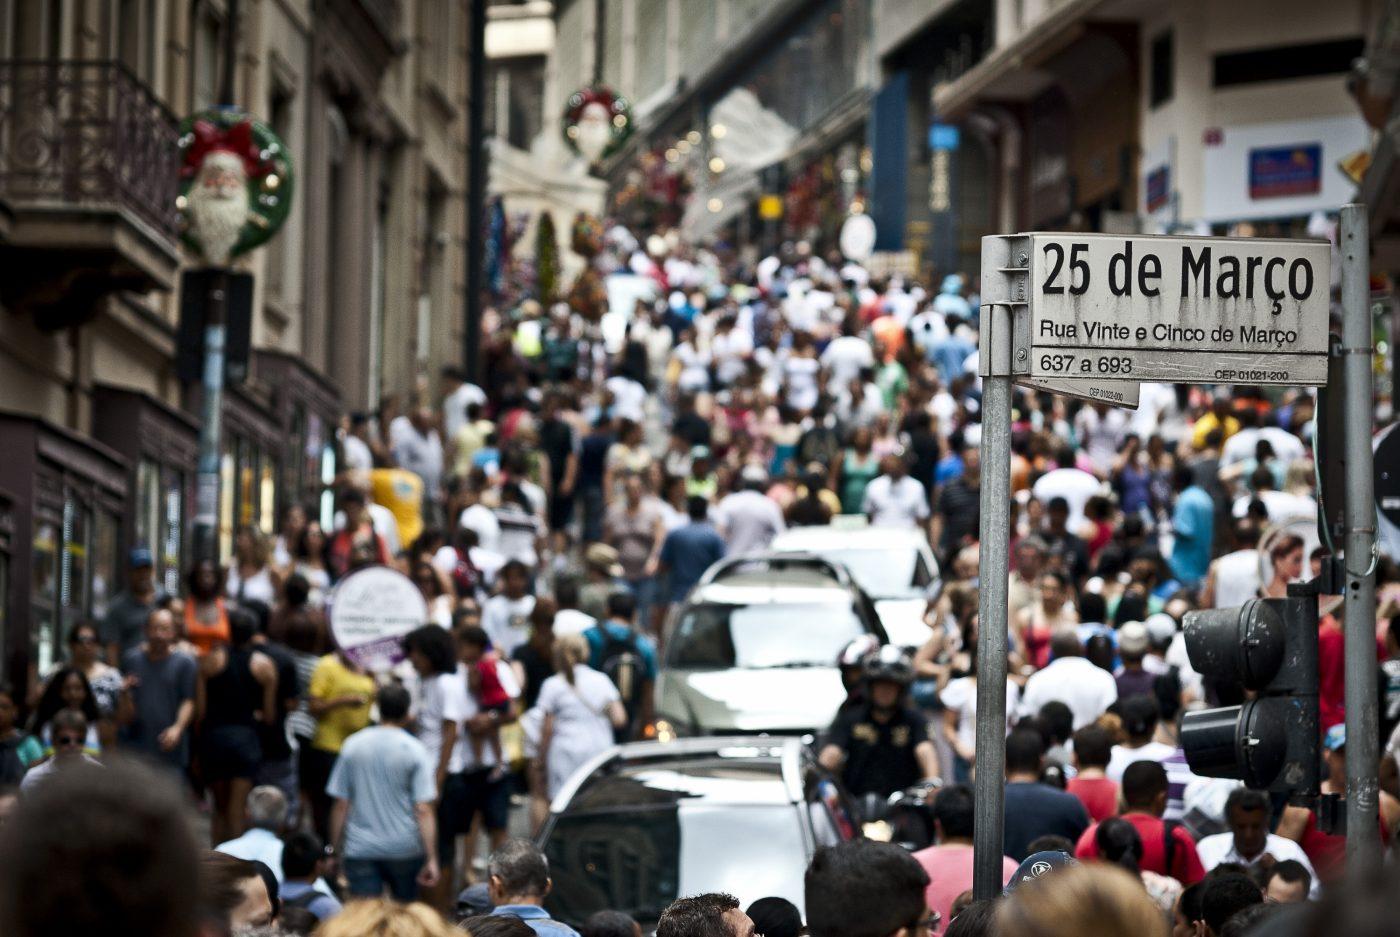 Feijóo alerta: Bolsonaro quer maquiar índice do IBGE para fazer de conta que o número de desempregados no Brasil é menor; veja vídeo